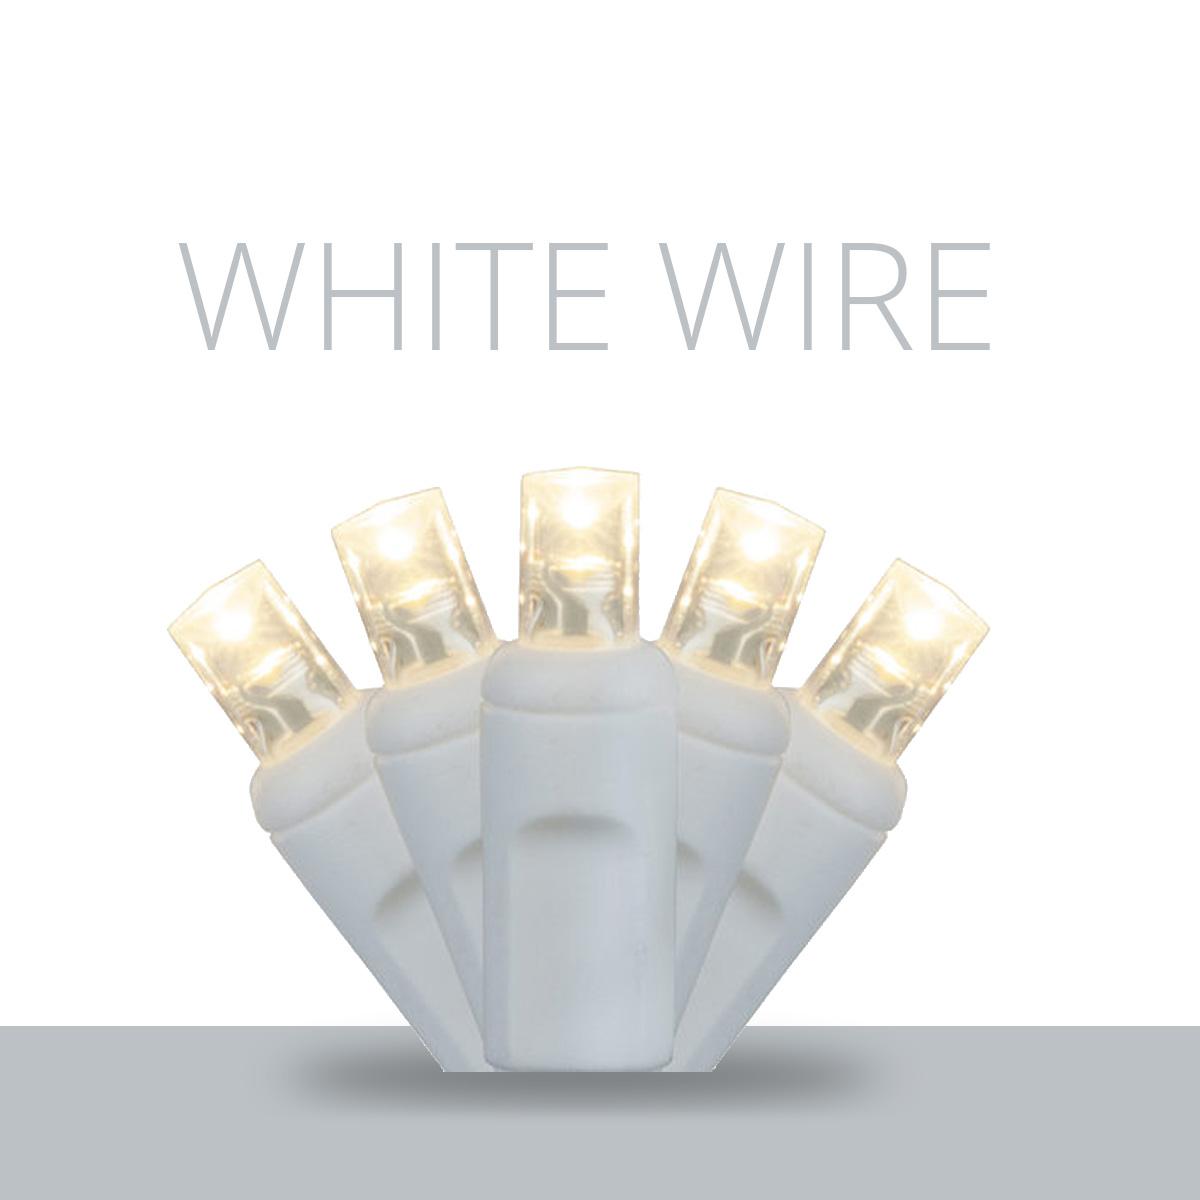 White Wire LED Mini Lights